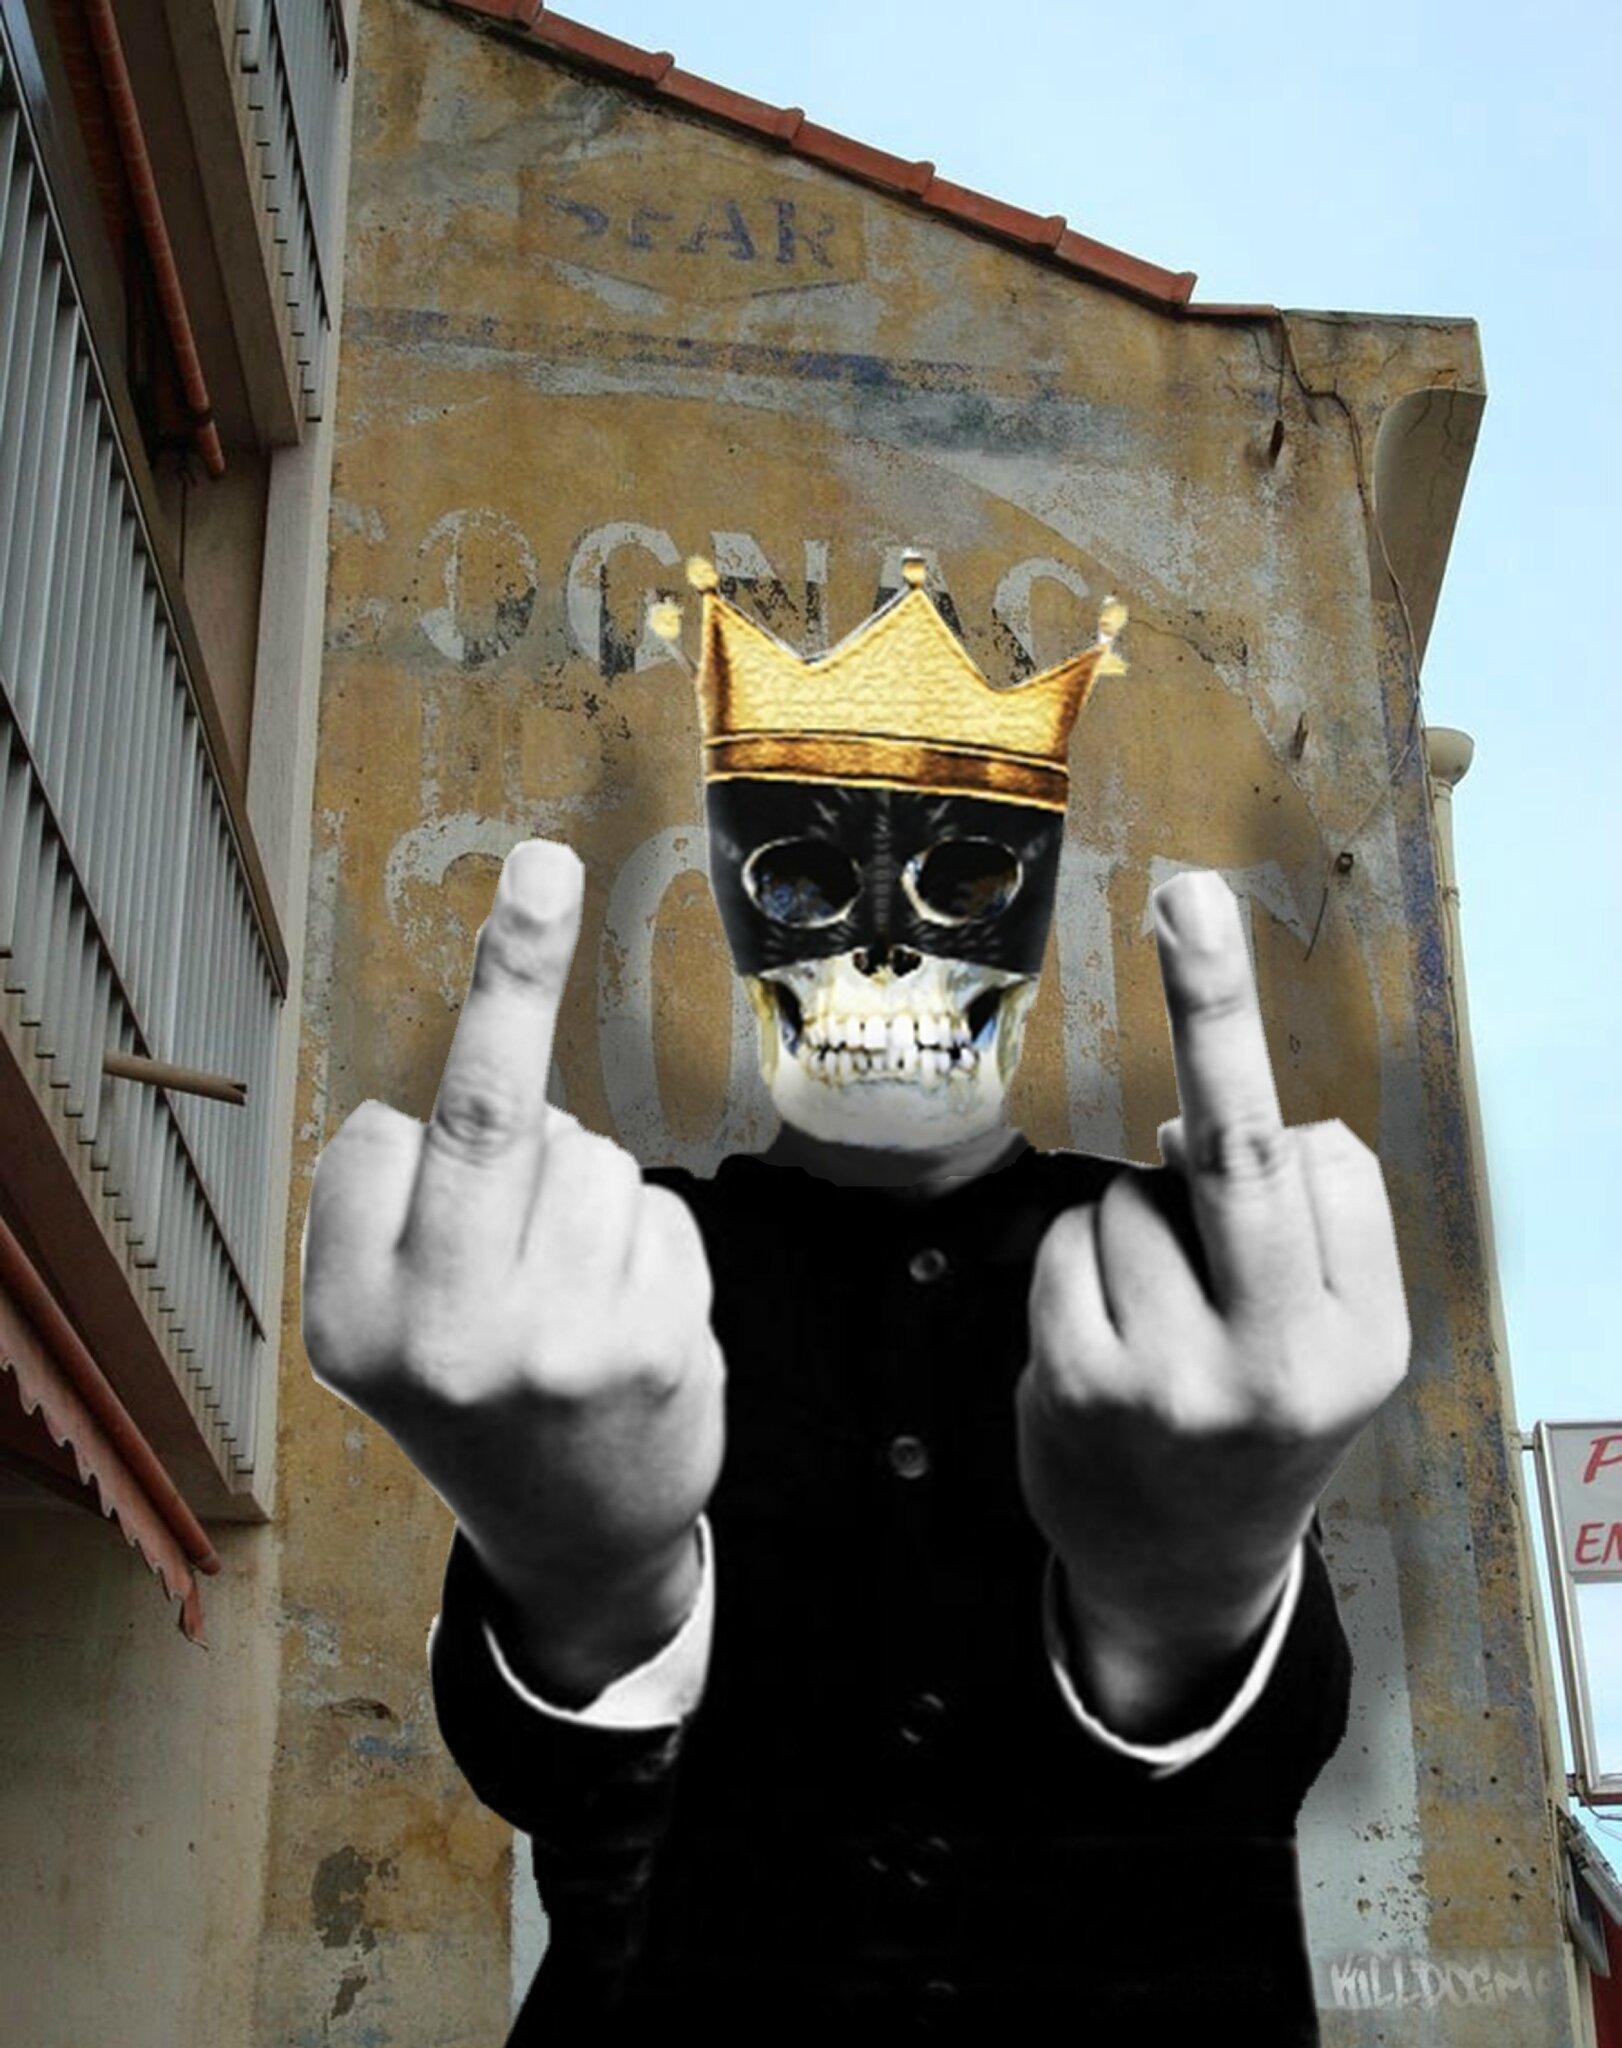 killdogme graffiti artist banksy graffiti artists graffiti. Black Bedroom Furniture Sets. Home Design Ideas